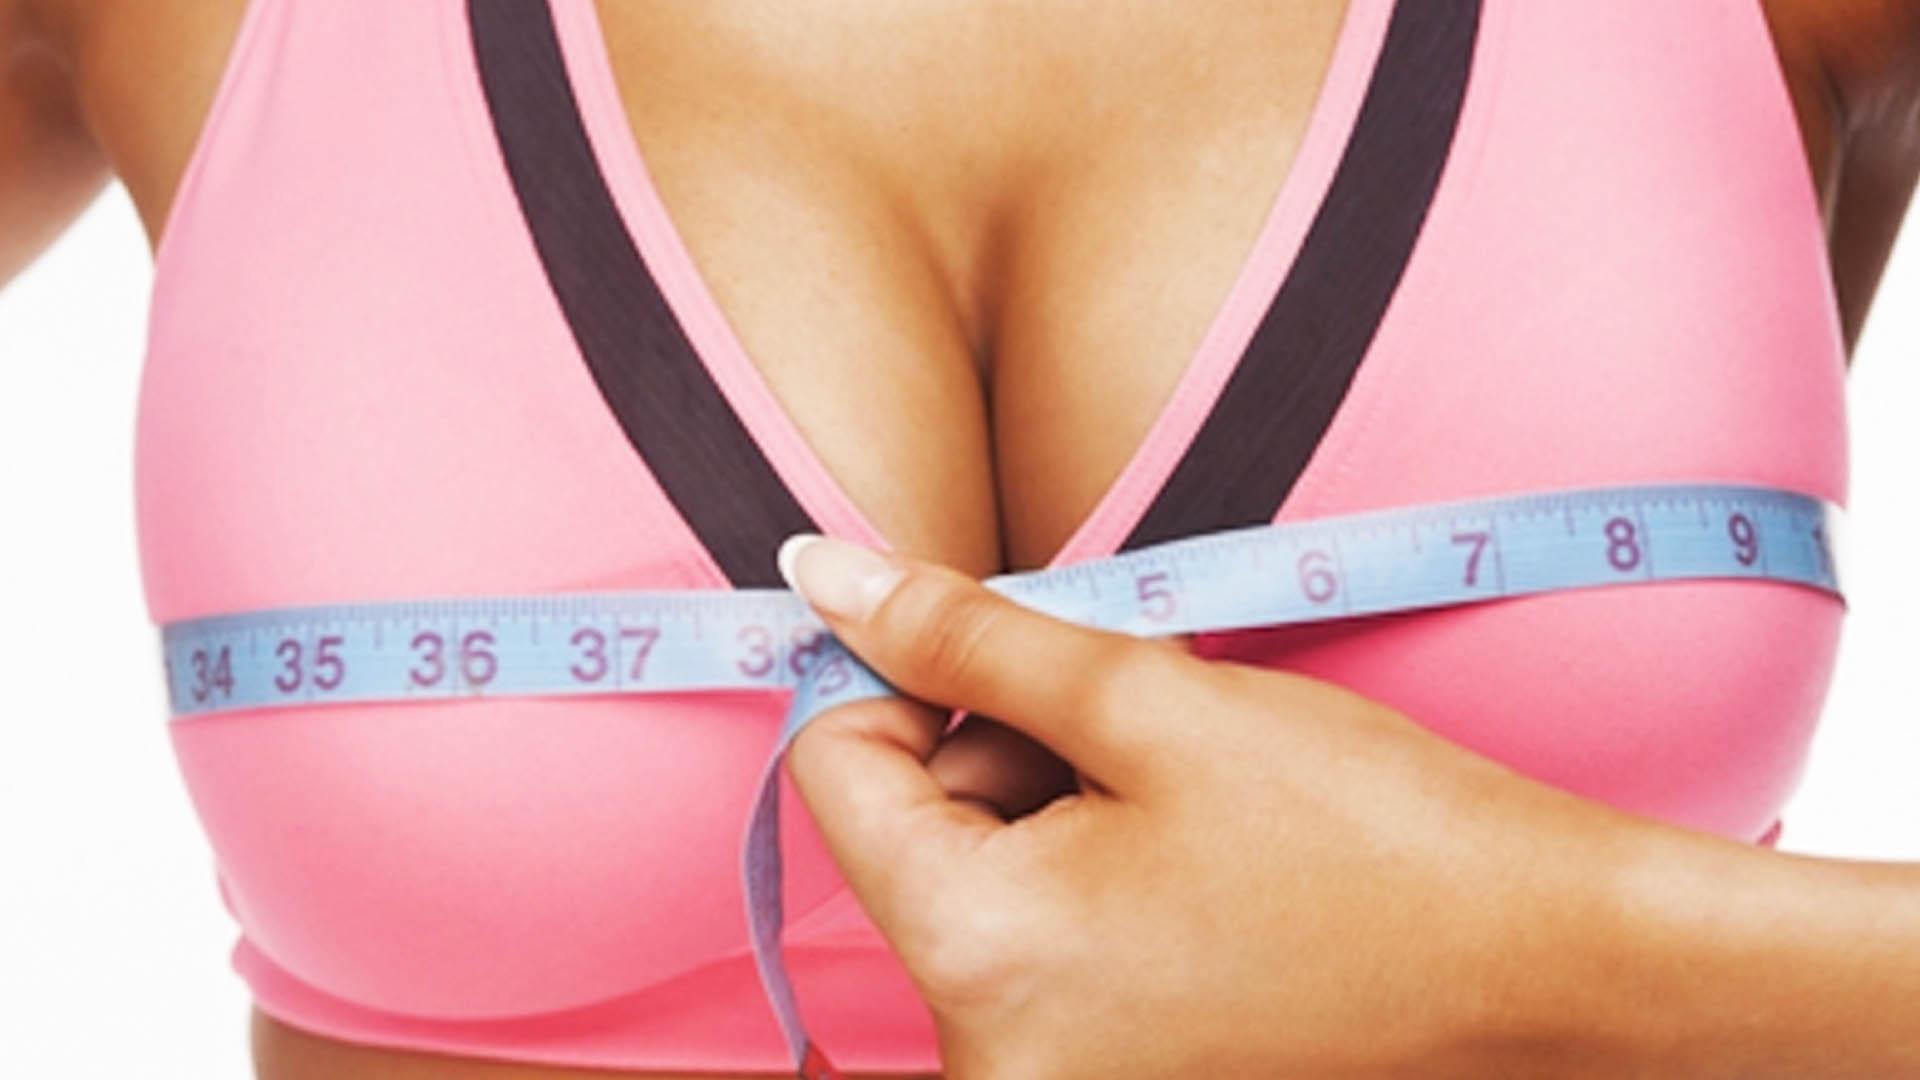 Картинки по запросу увеличение груди